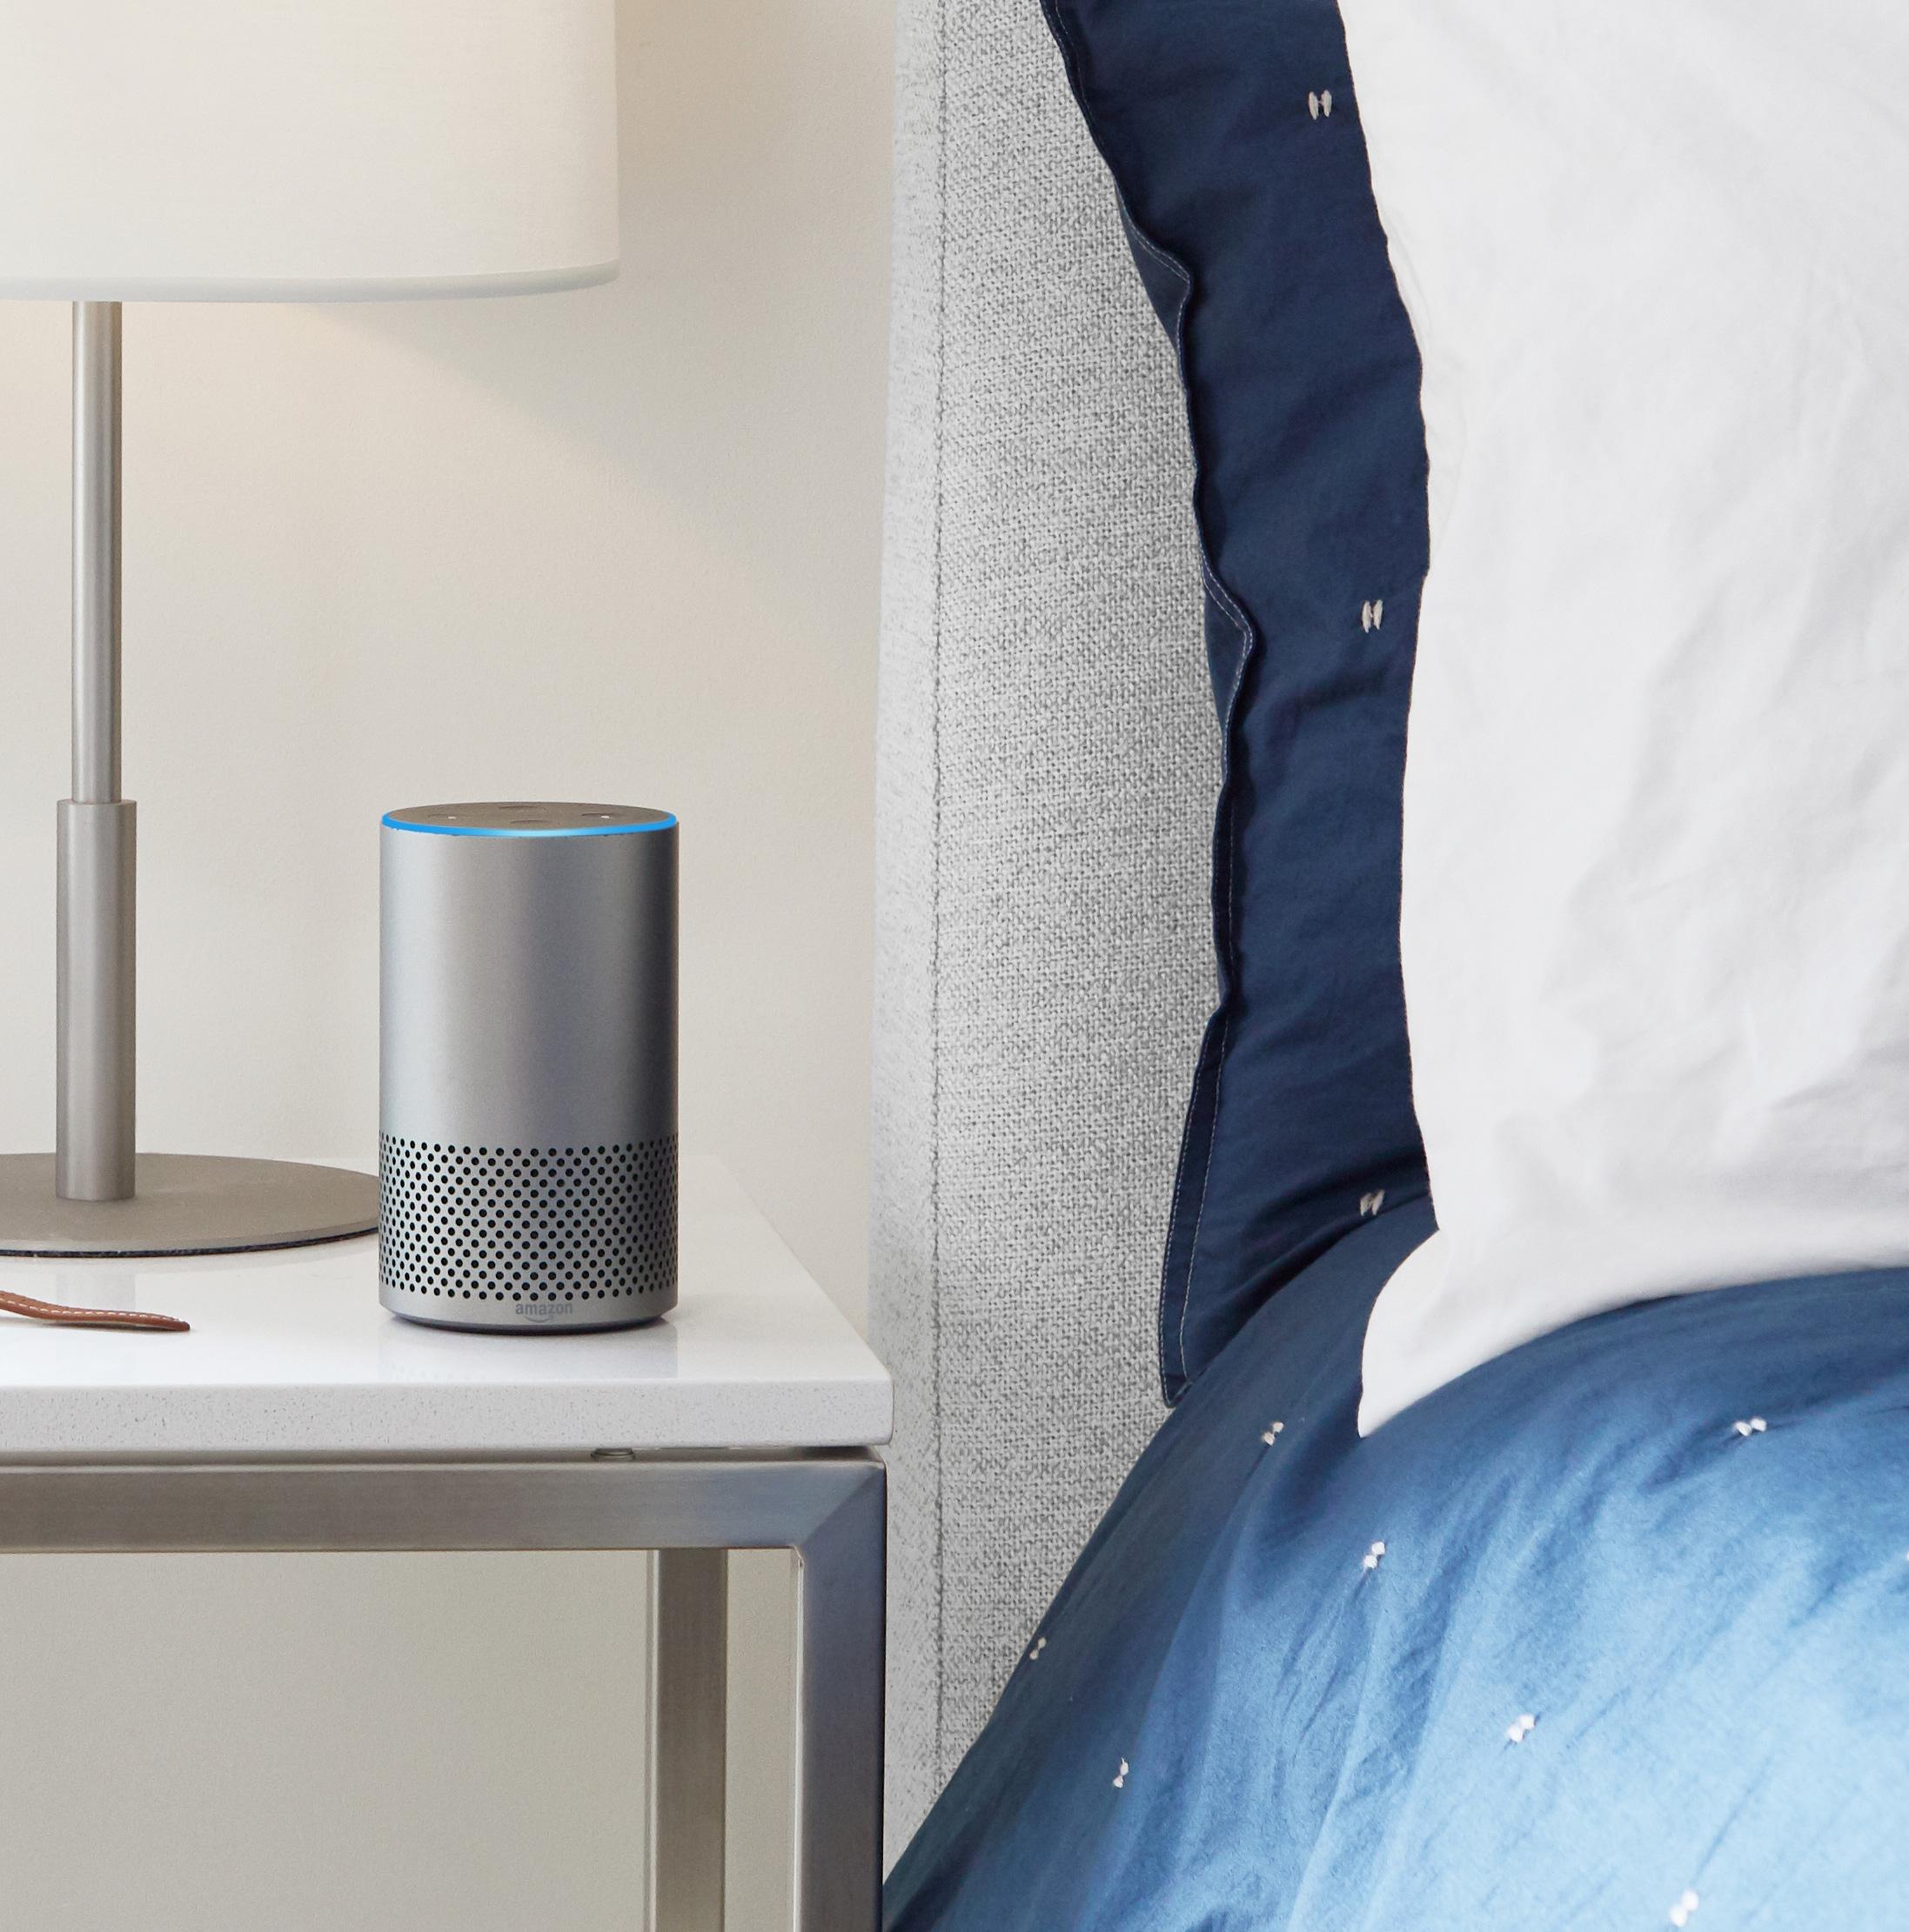 Amazon announces 2nd-gen Echo, Echo Plus, Echo Spot and new